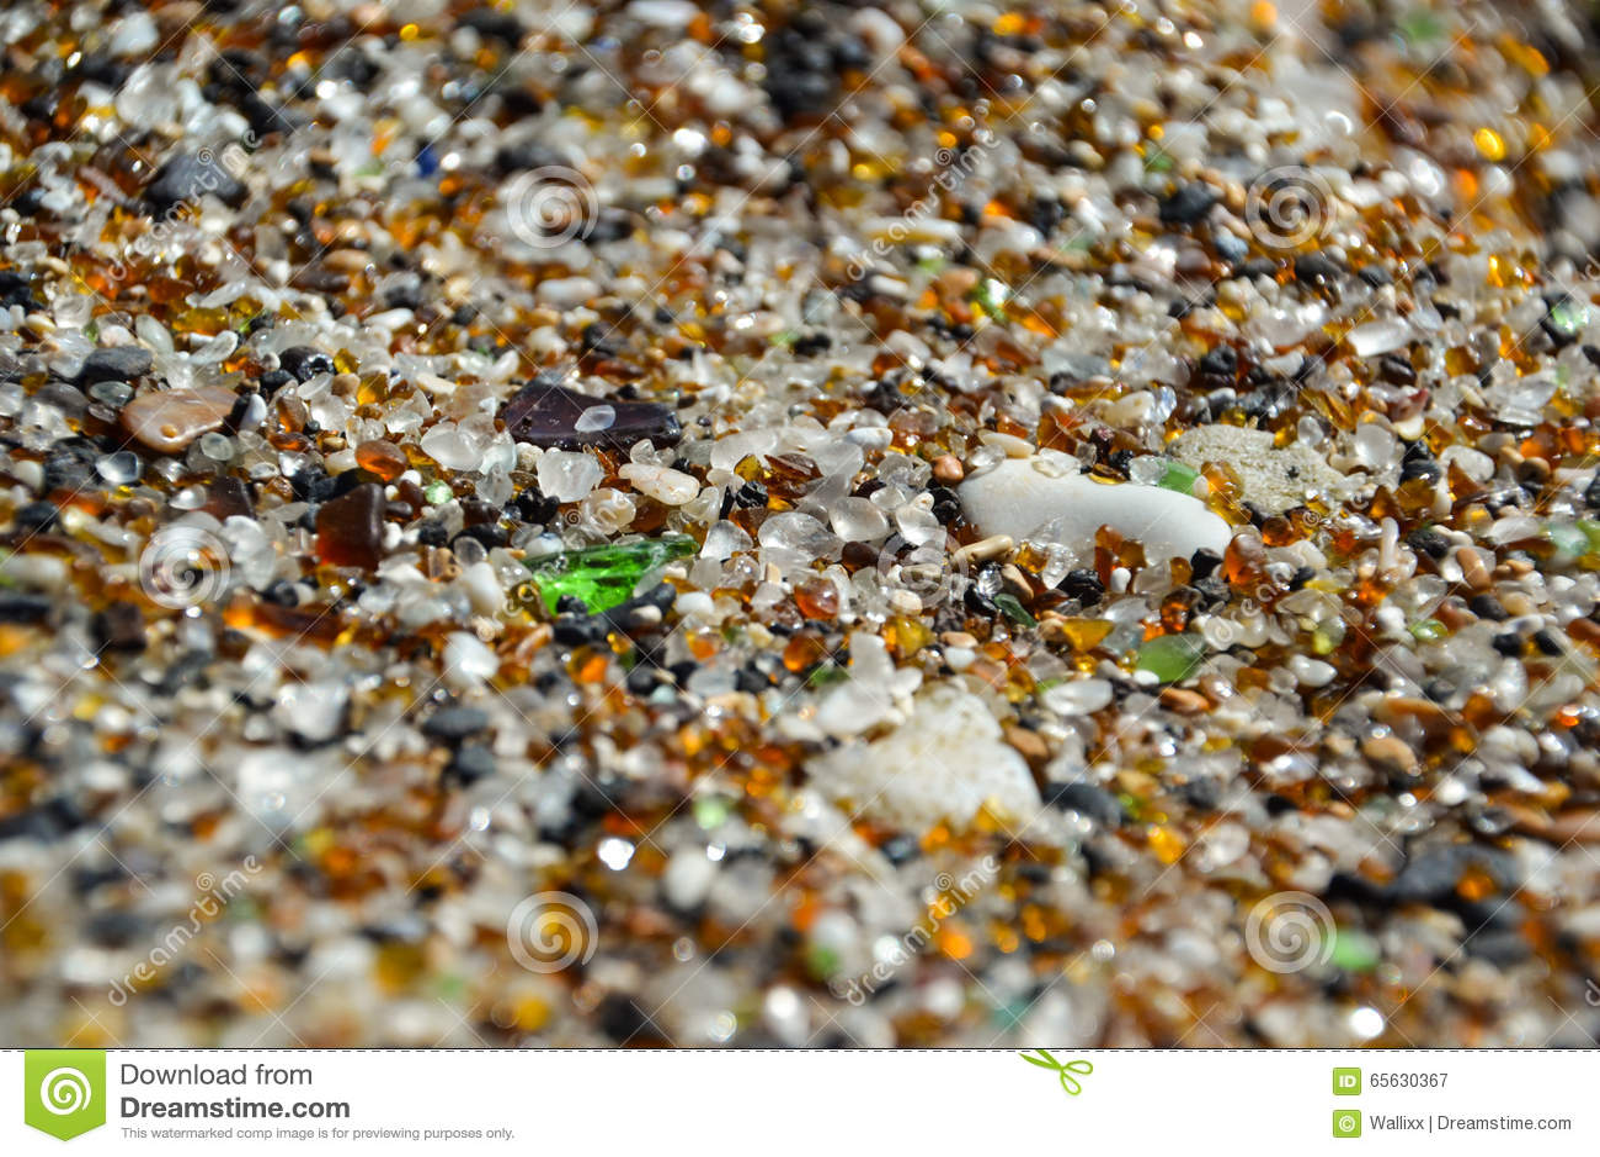 Fin - sable sur la plage en verre - Hanapepe, Kauai